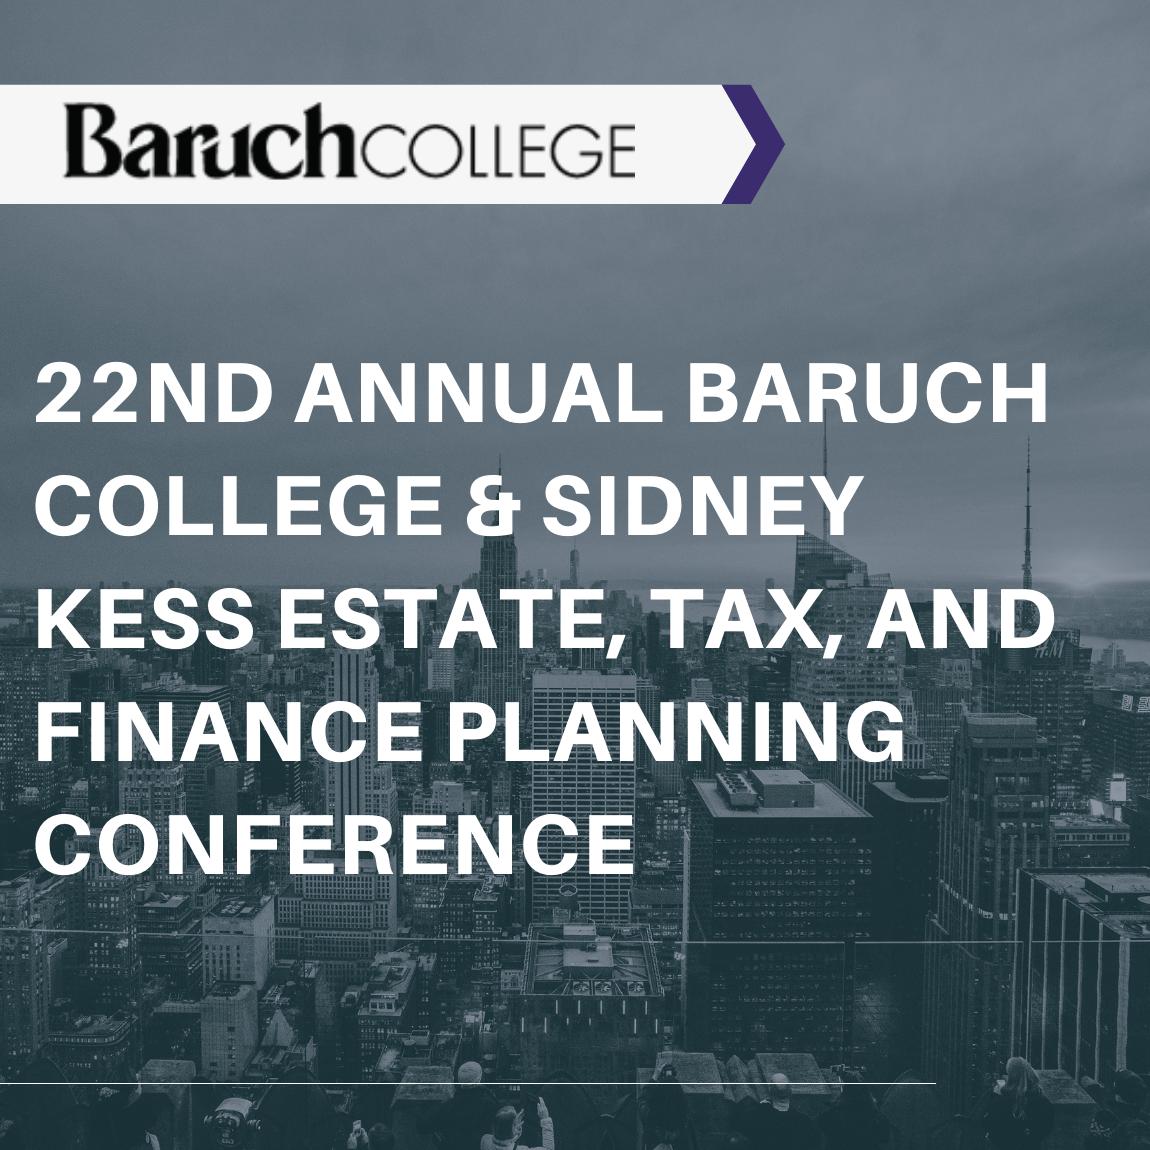 Baruch22 squarebanner